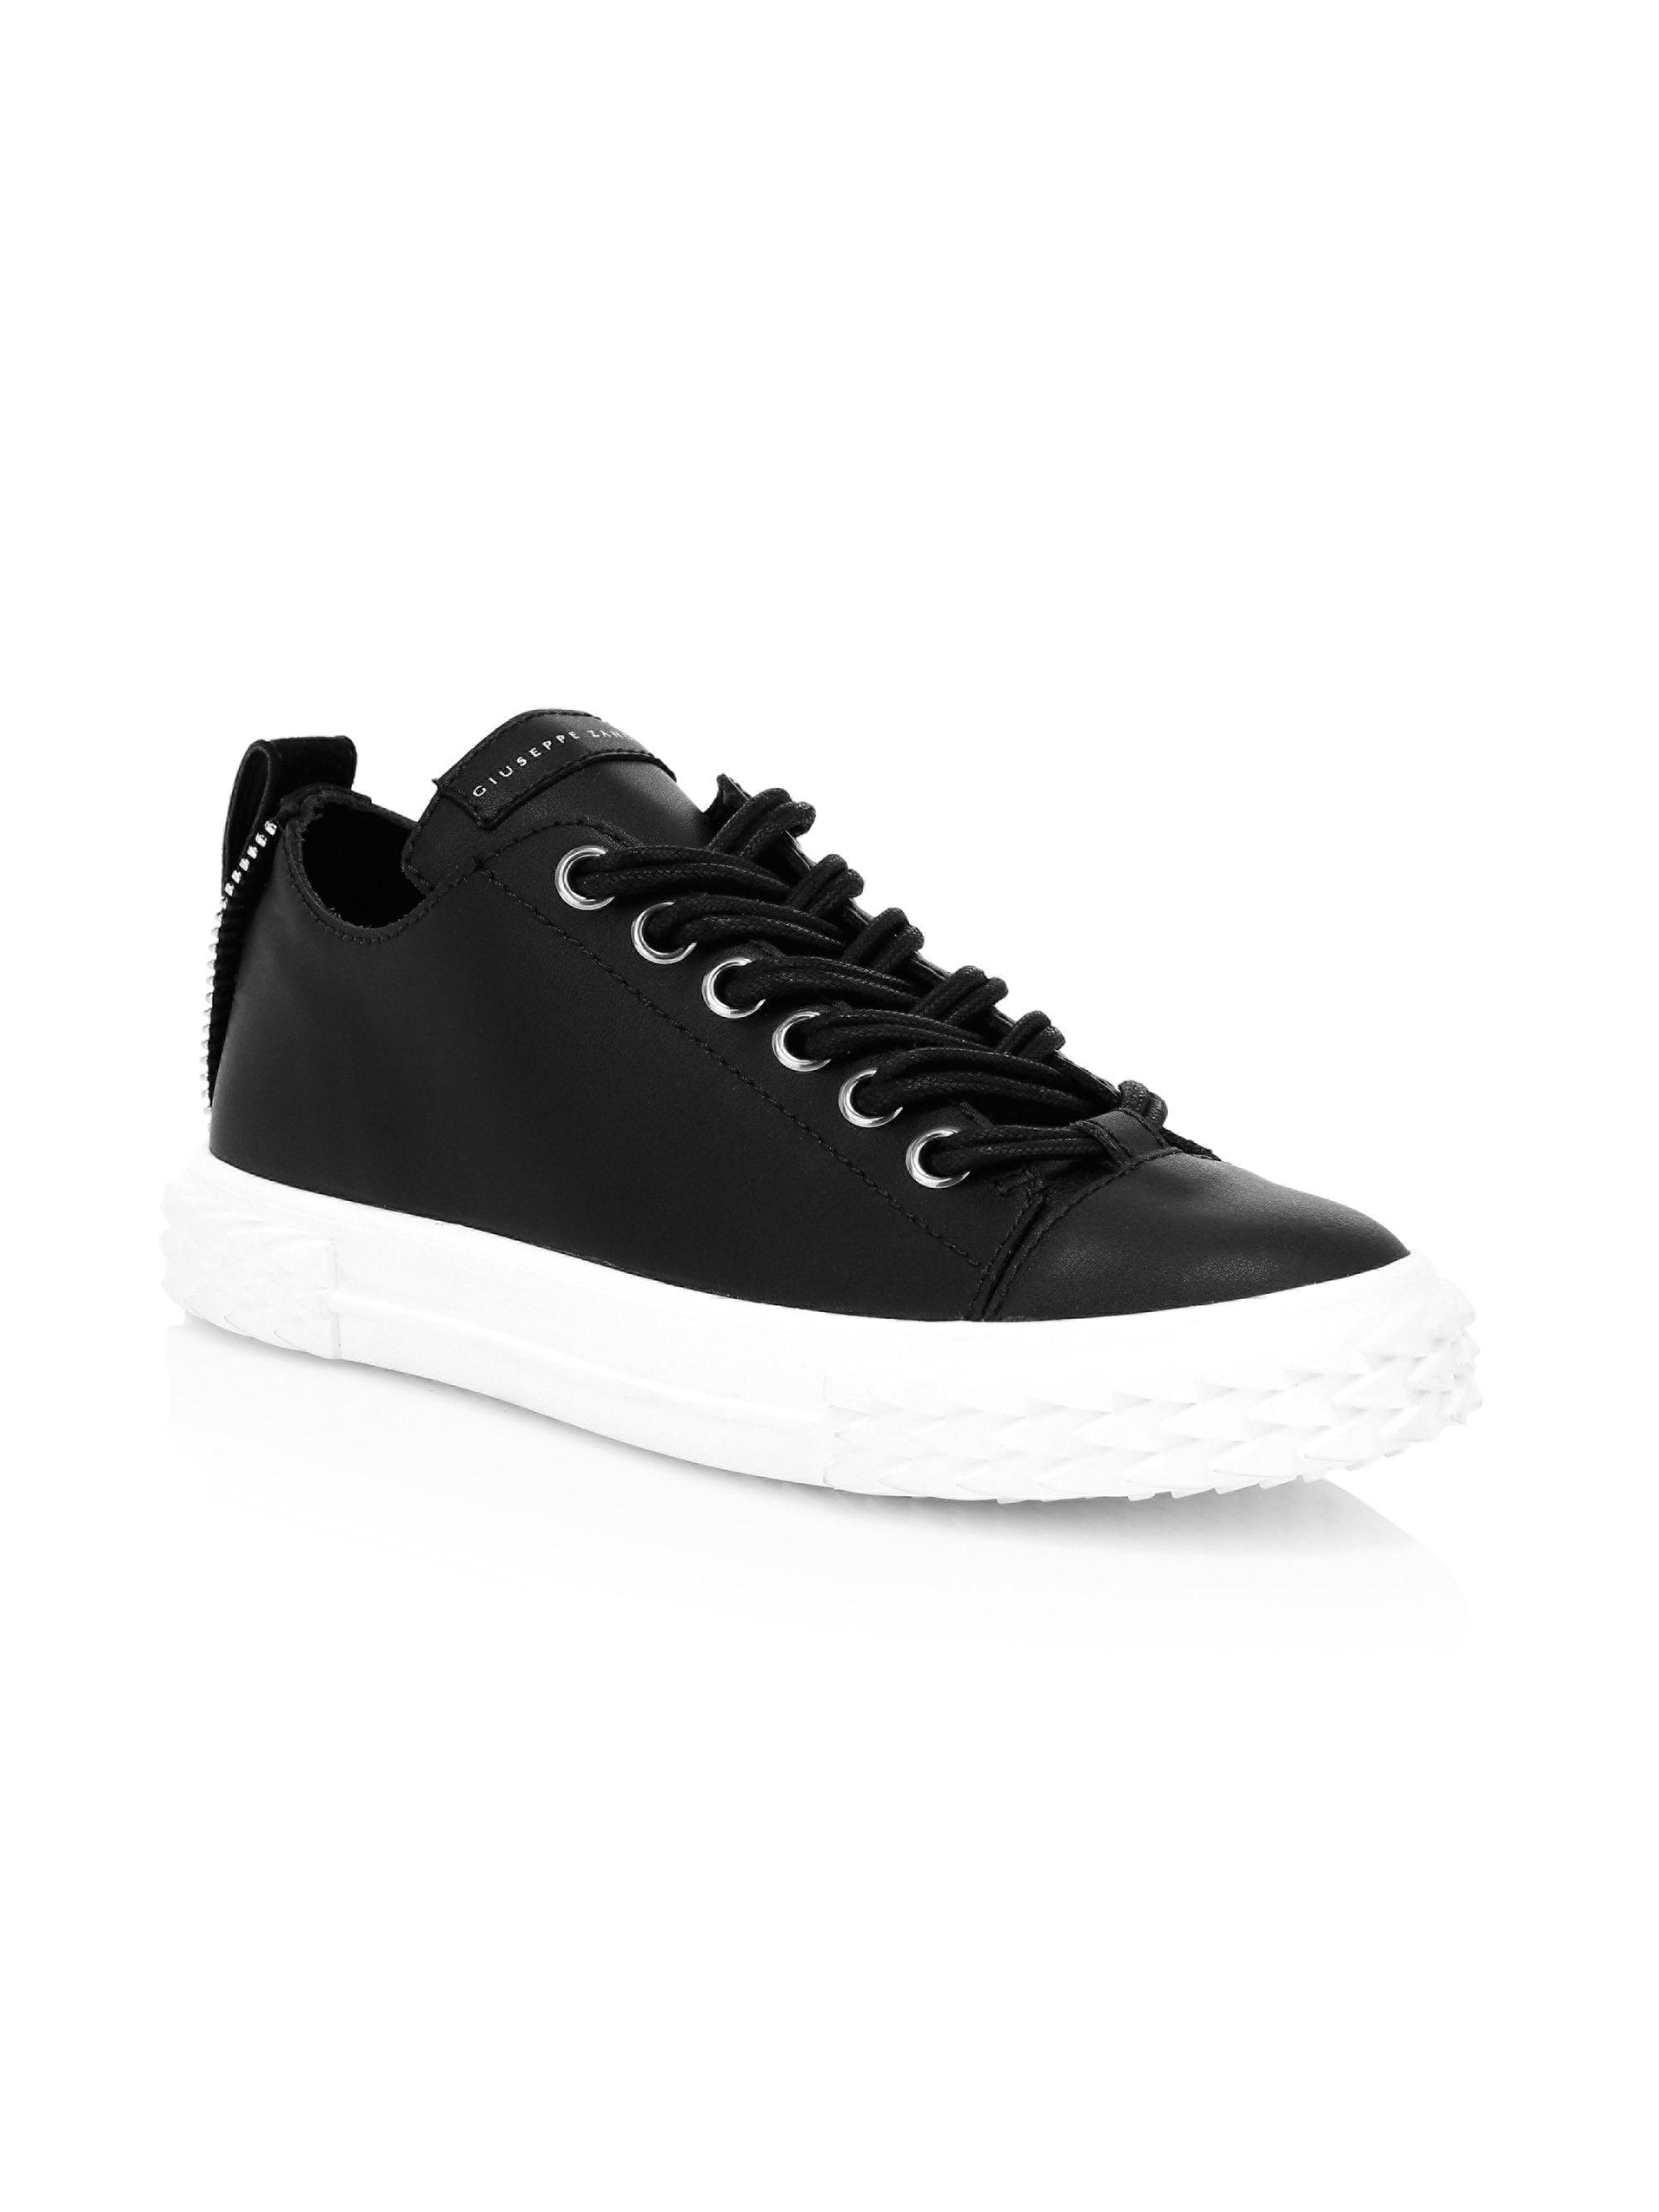 00f673b2ca35e Giuseppe Zanotti Women's Blabber Leather Low-top Sneakers - Bianco ...